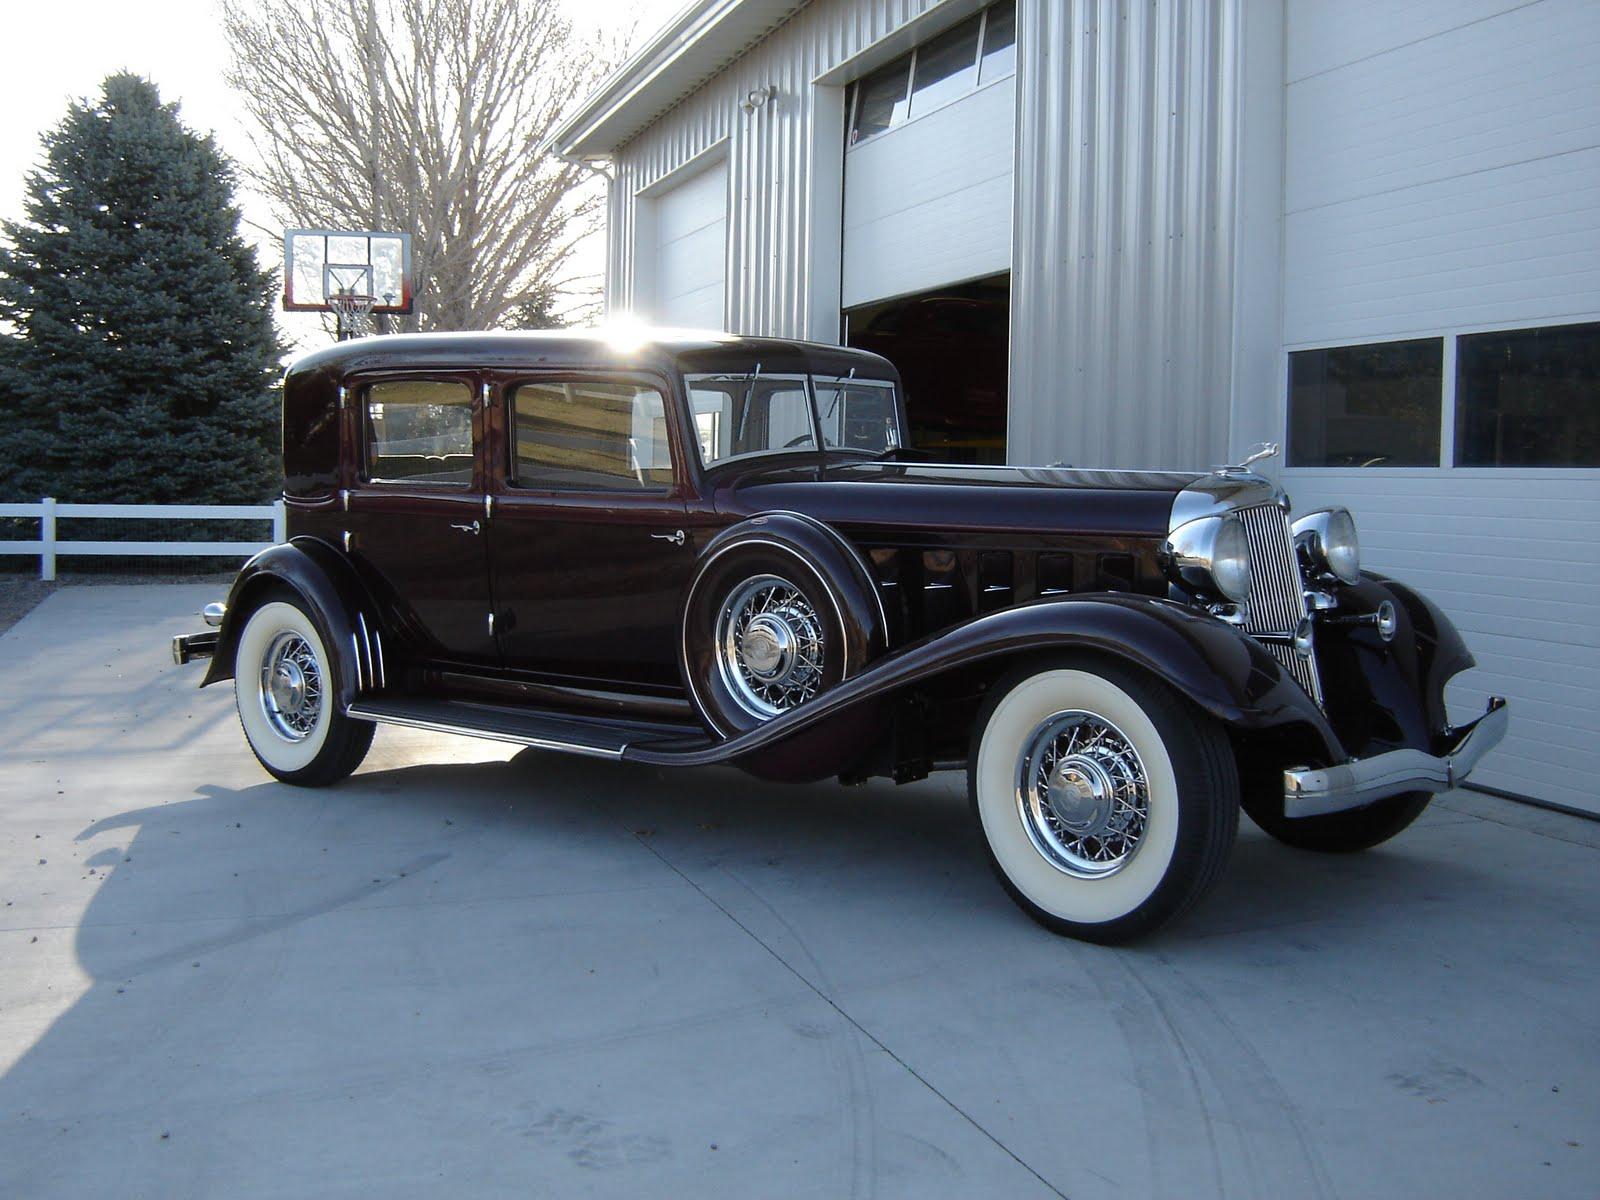 Jeff's Automotive Service & Repair LLC: 1933 Chrysler Imperial